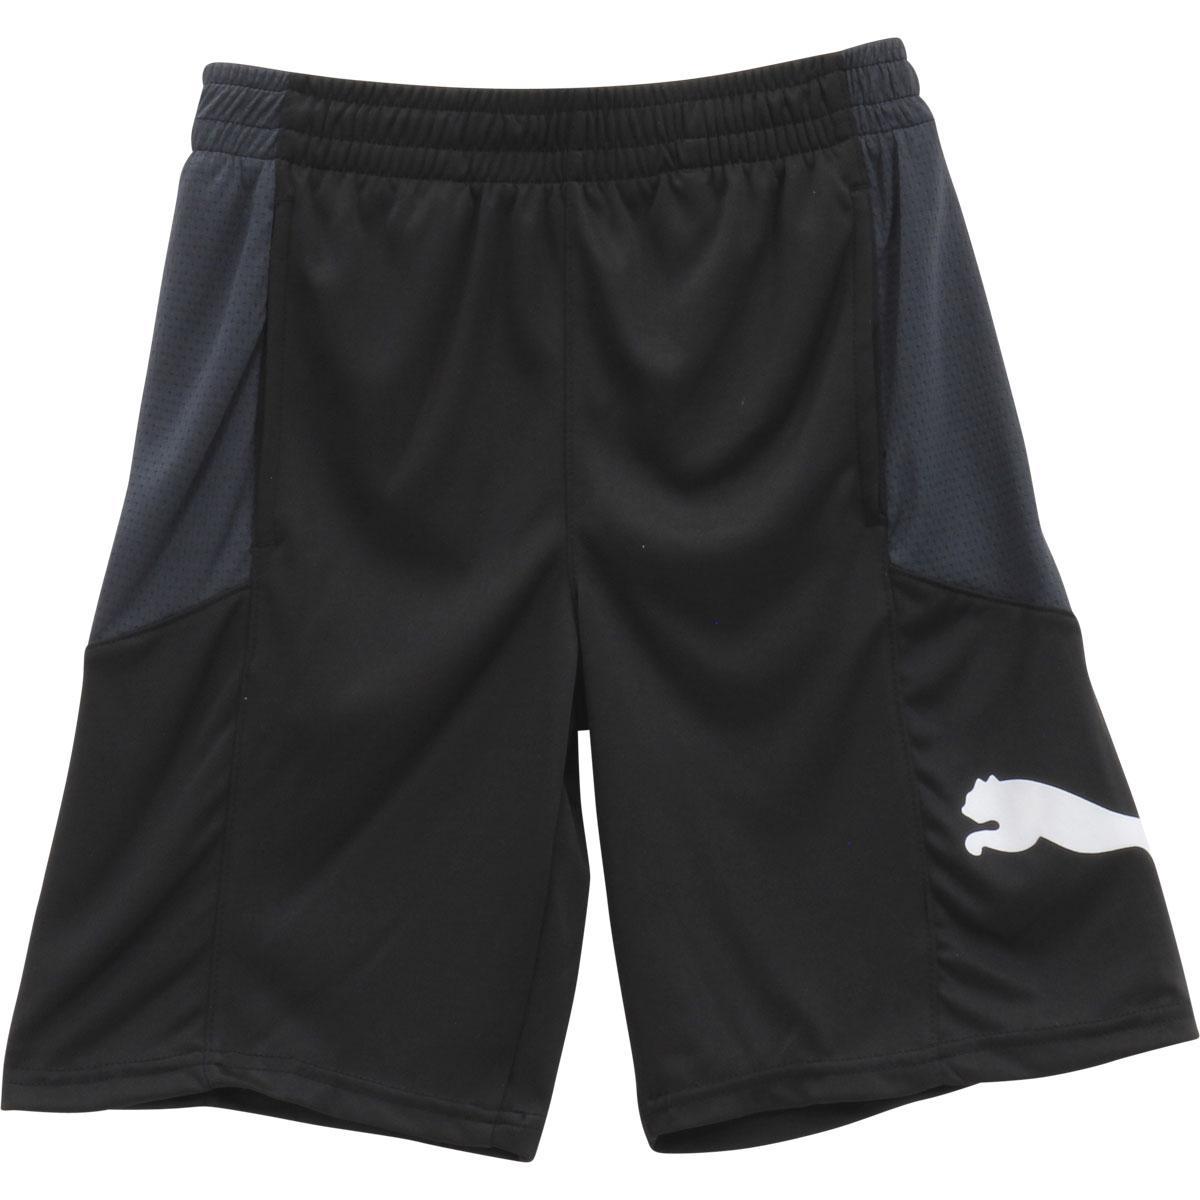 Image of Puma Big Boy's Cat Logo Elastic Waist Mesh Gym Shorts - Black - Medium